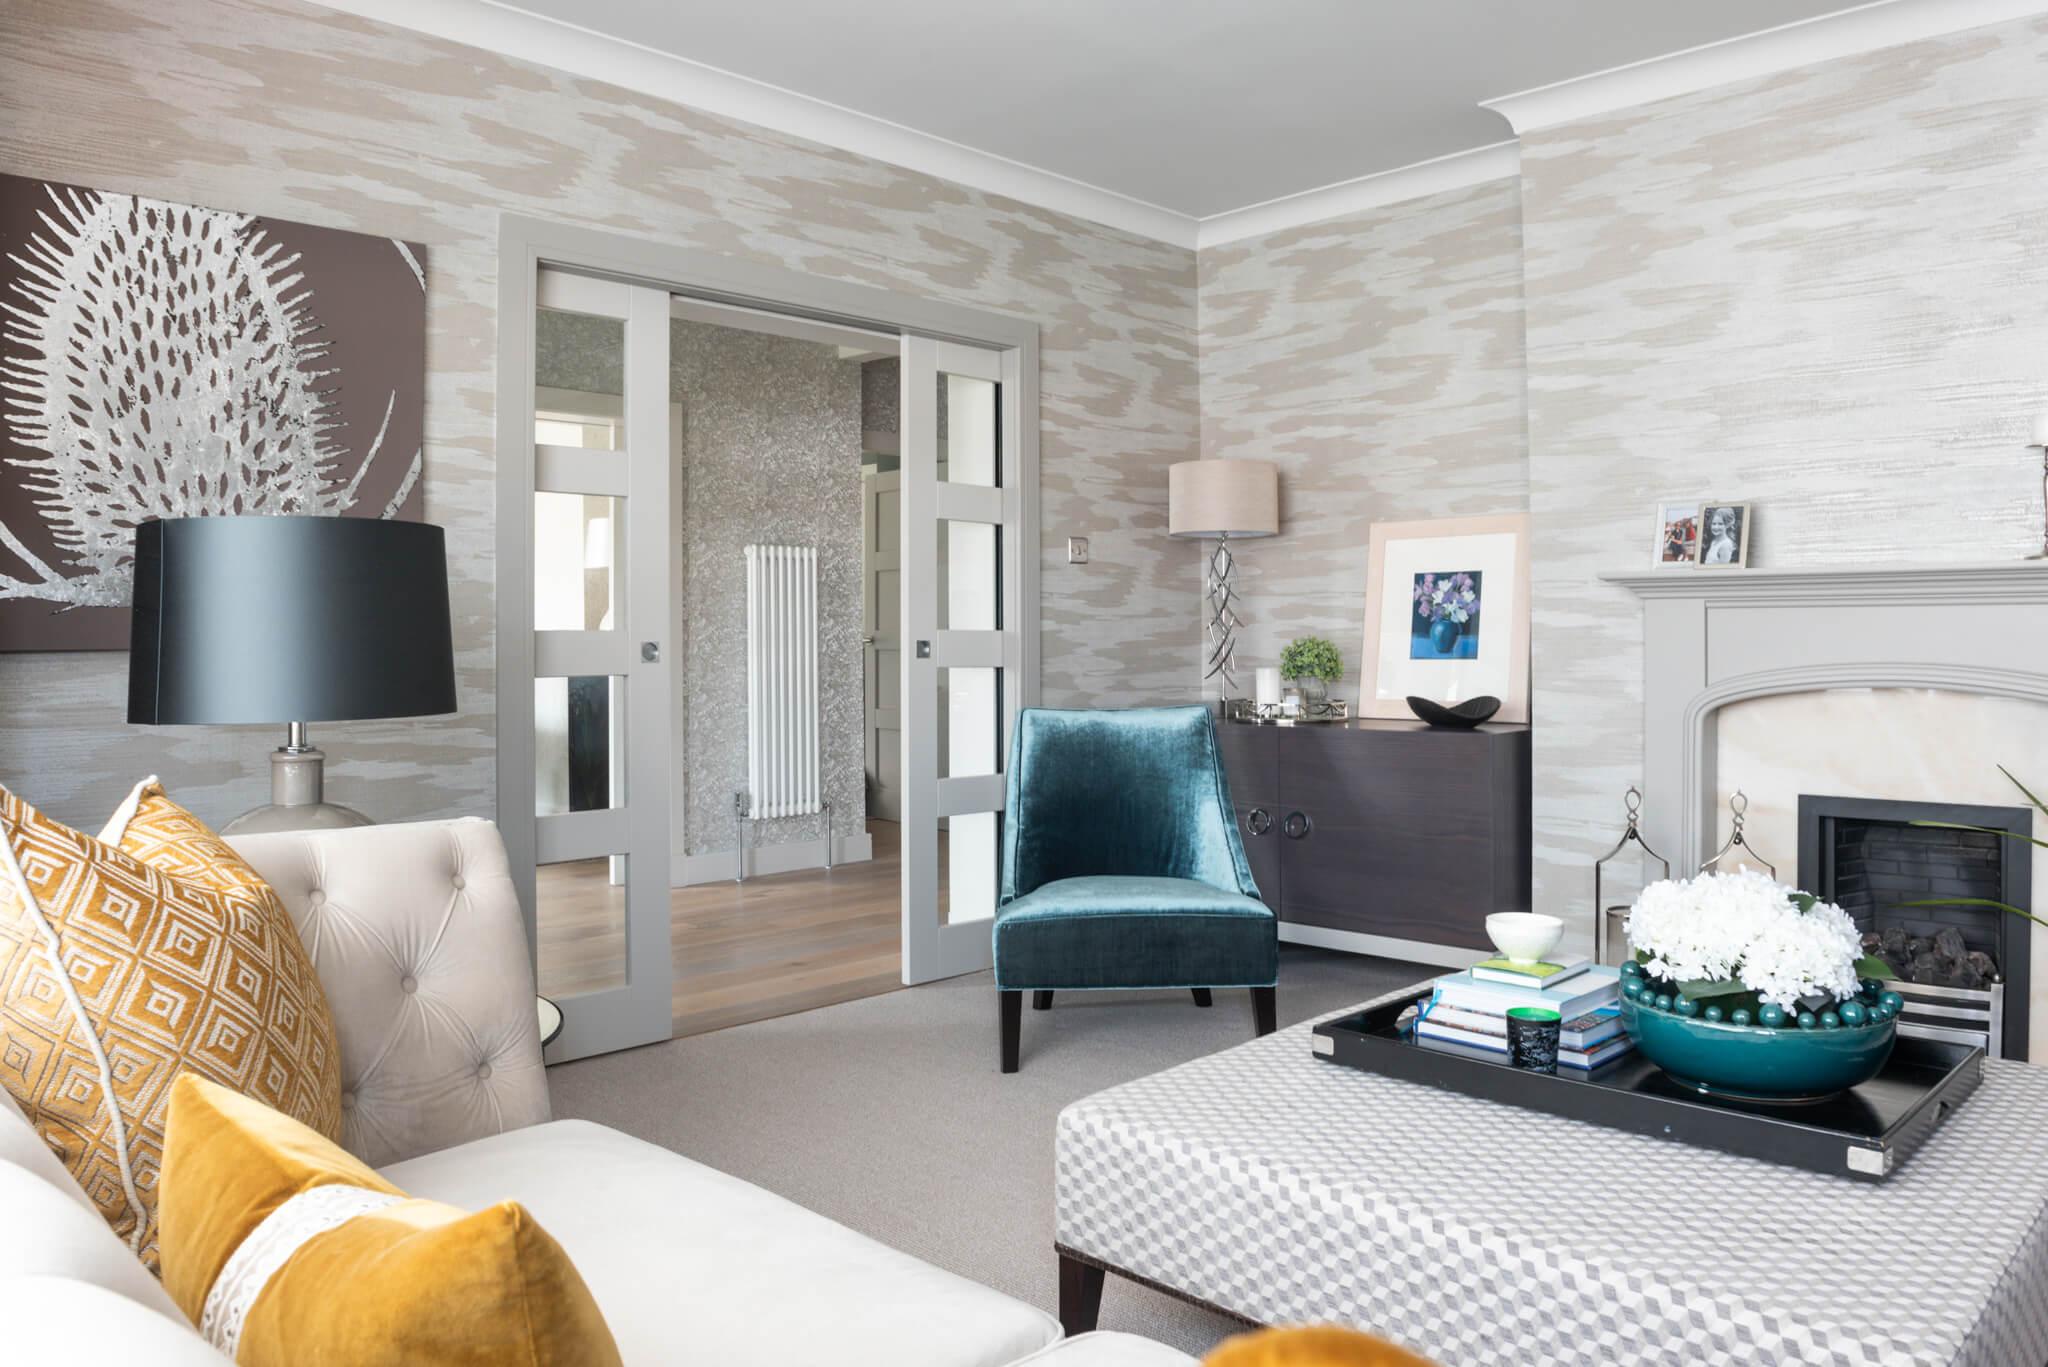 chelsea_mclaine-interior_hamilton-ryanjohnstonco-11